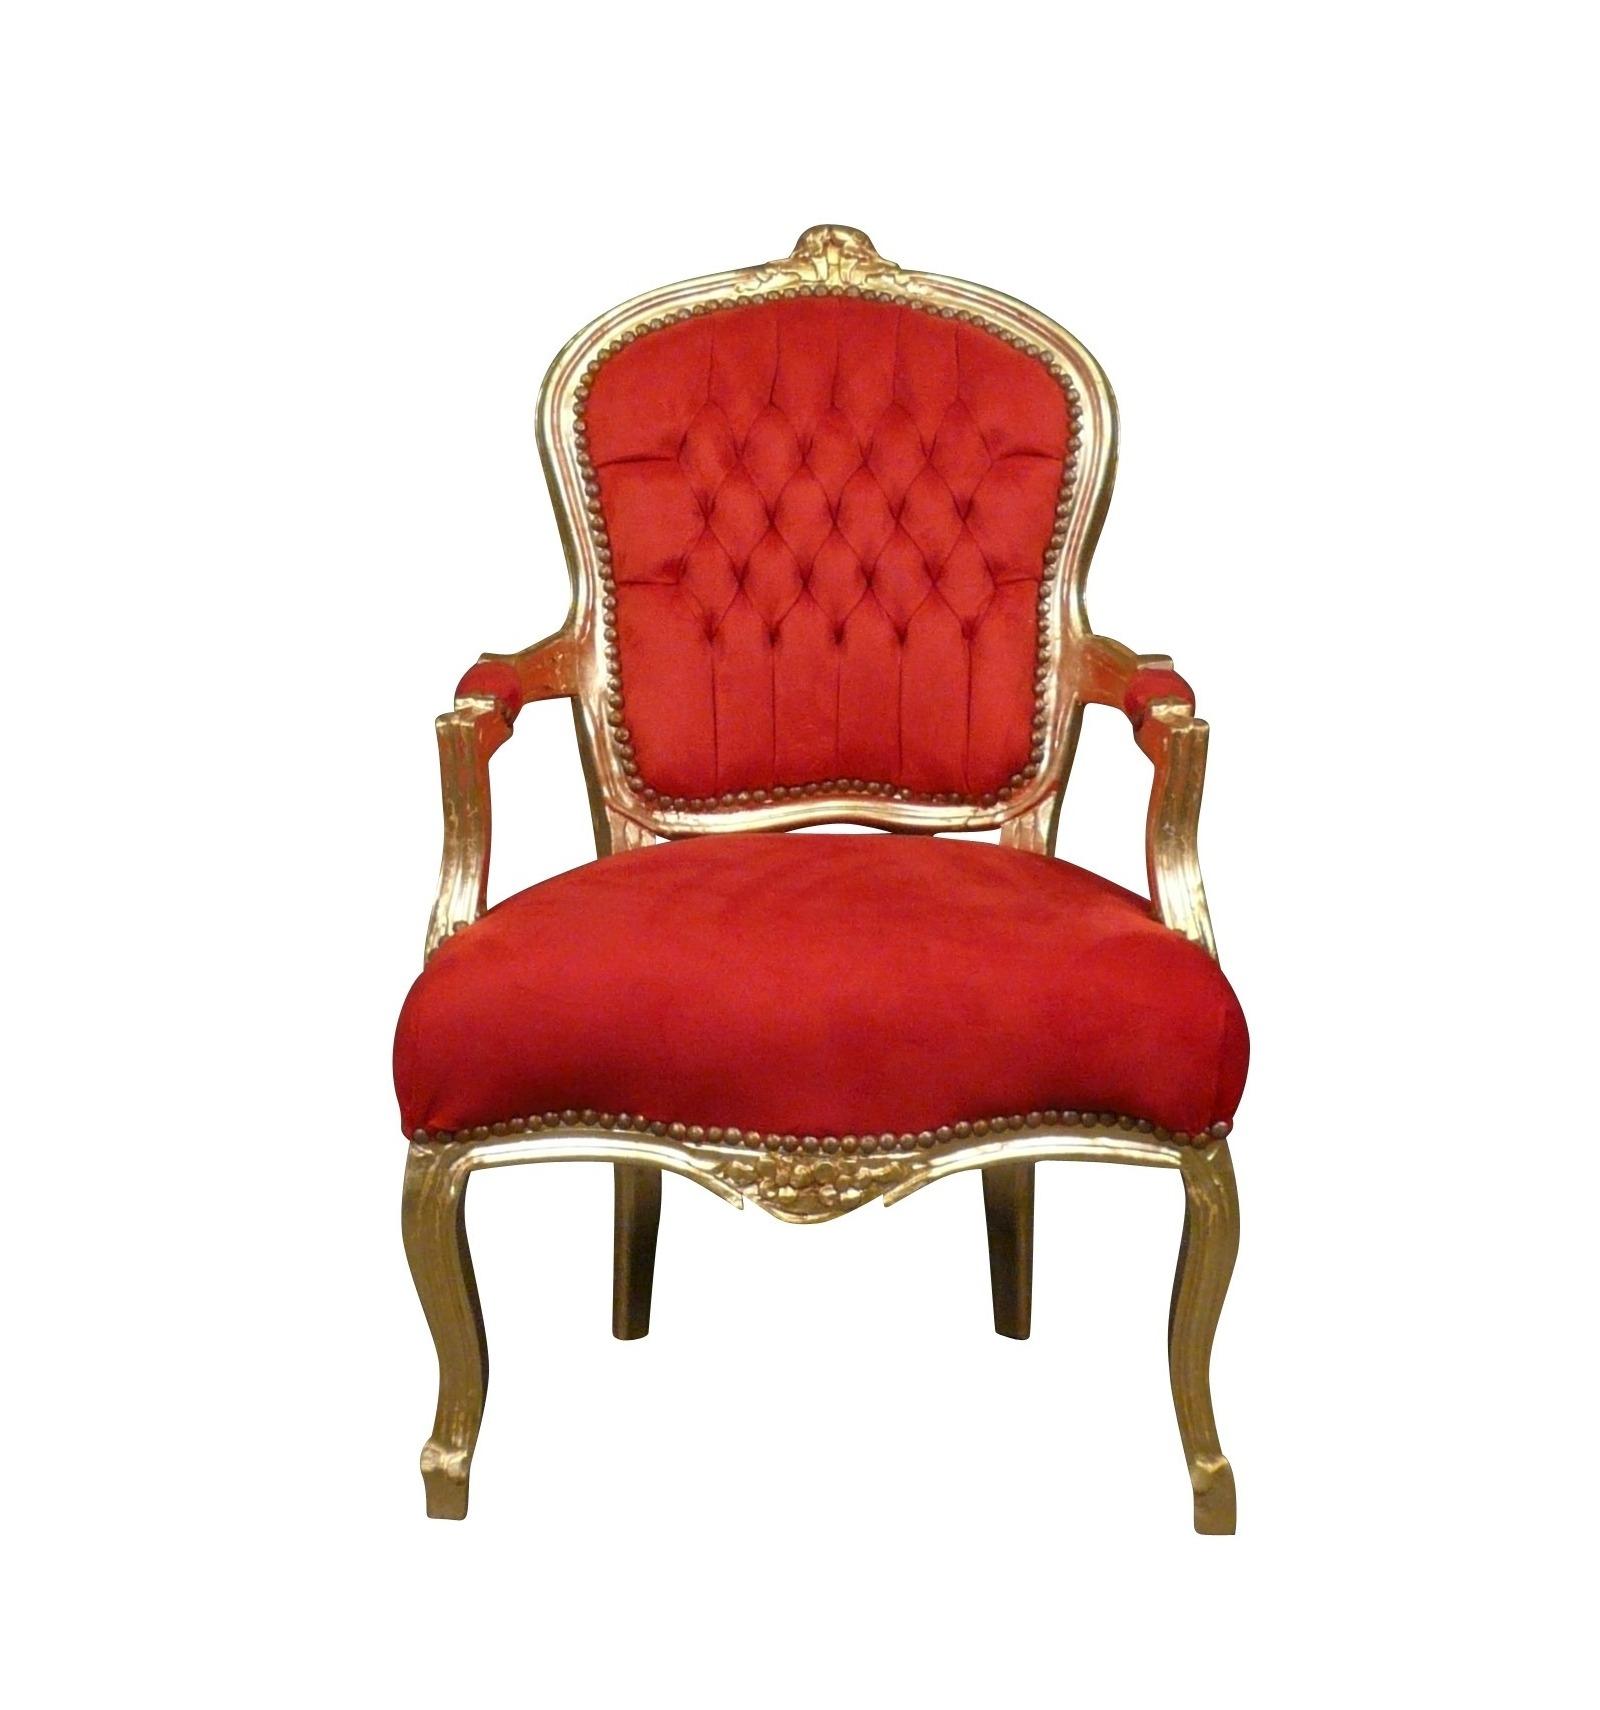 fauteuil louis xv baroque rouge et or. Black Bedroom Furniture Sets. Home Design Ideas